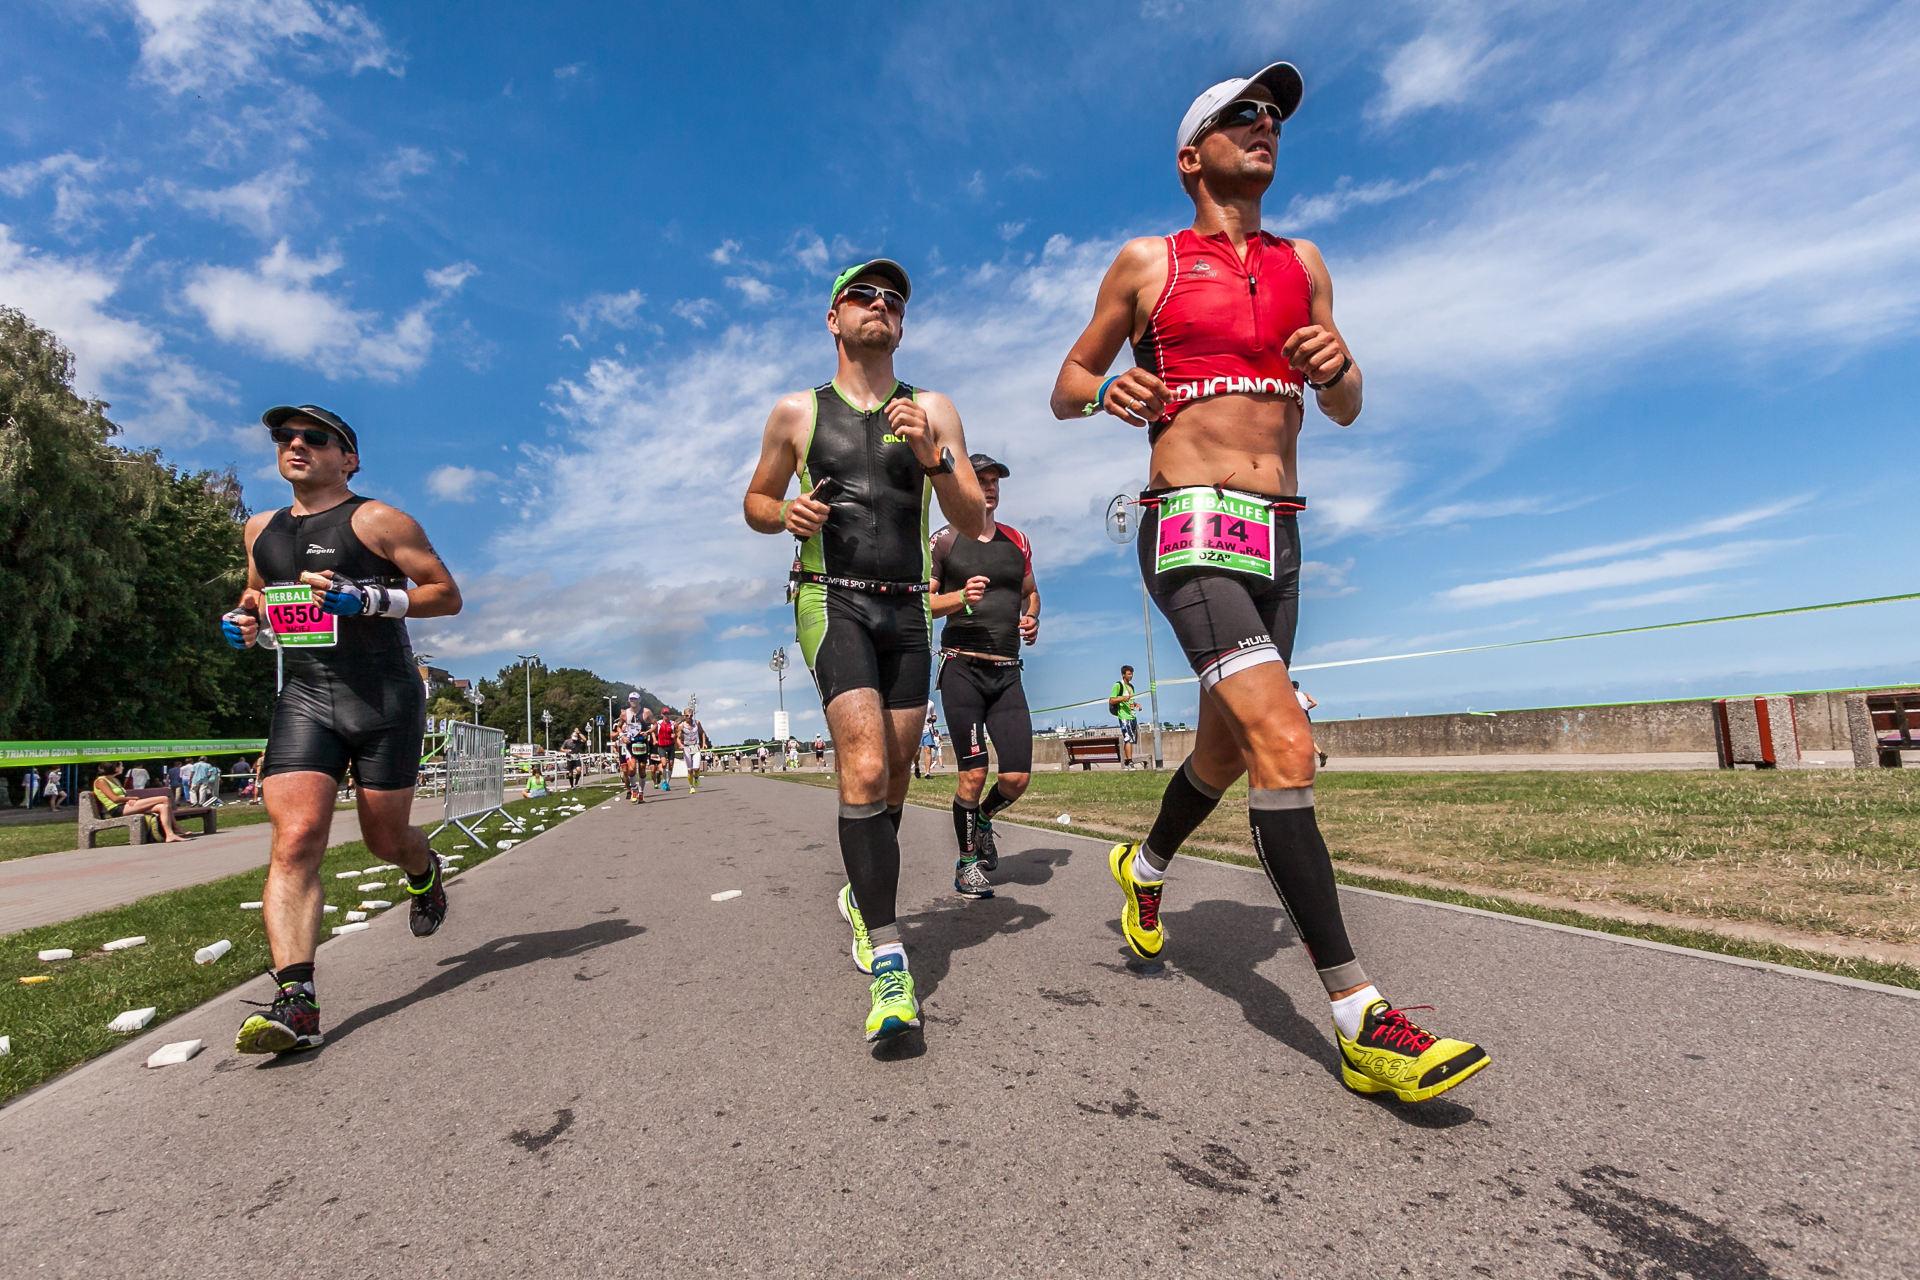 triathlon-bieg